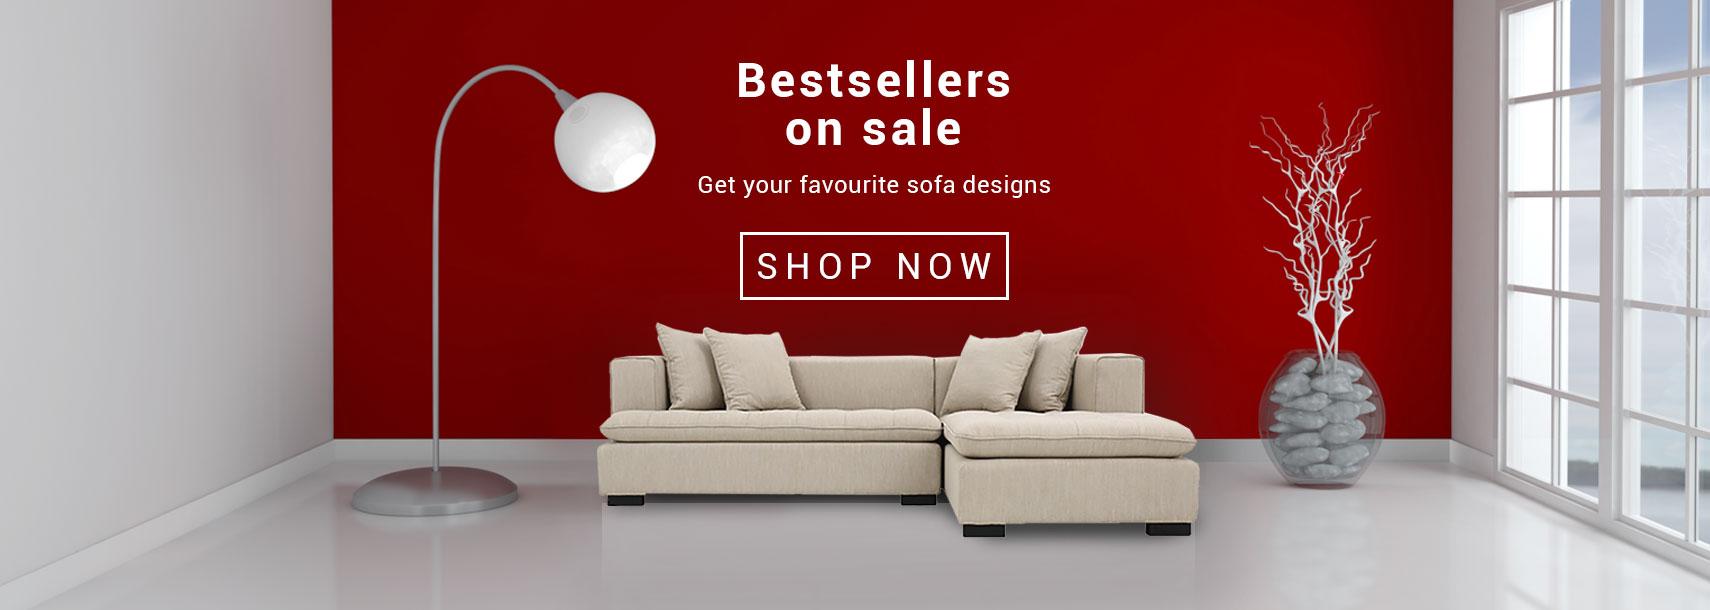 Bestselling Sofas on Sale!